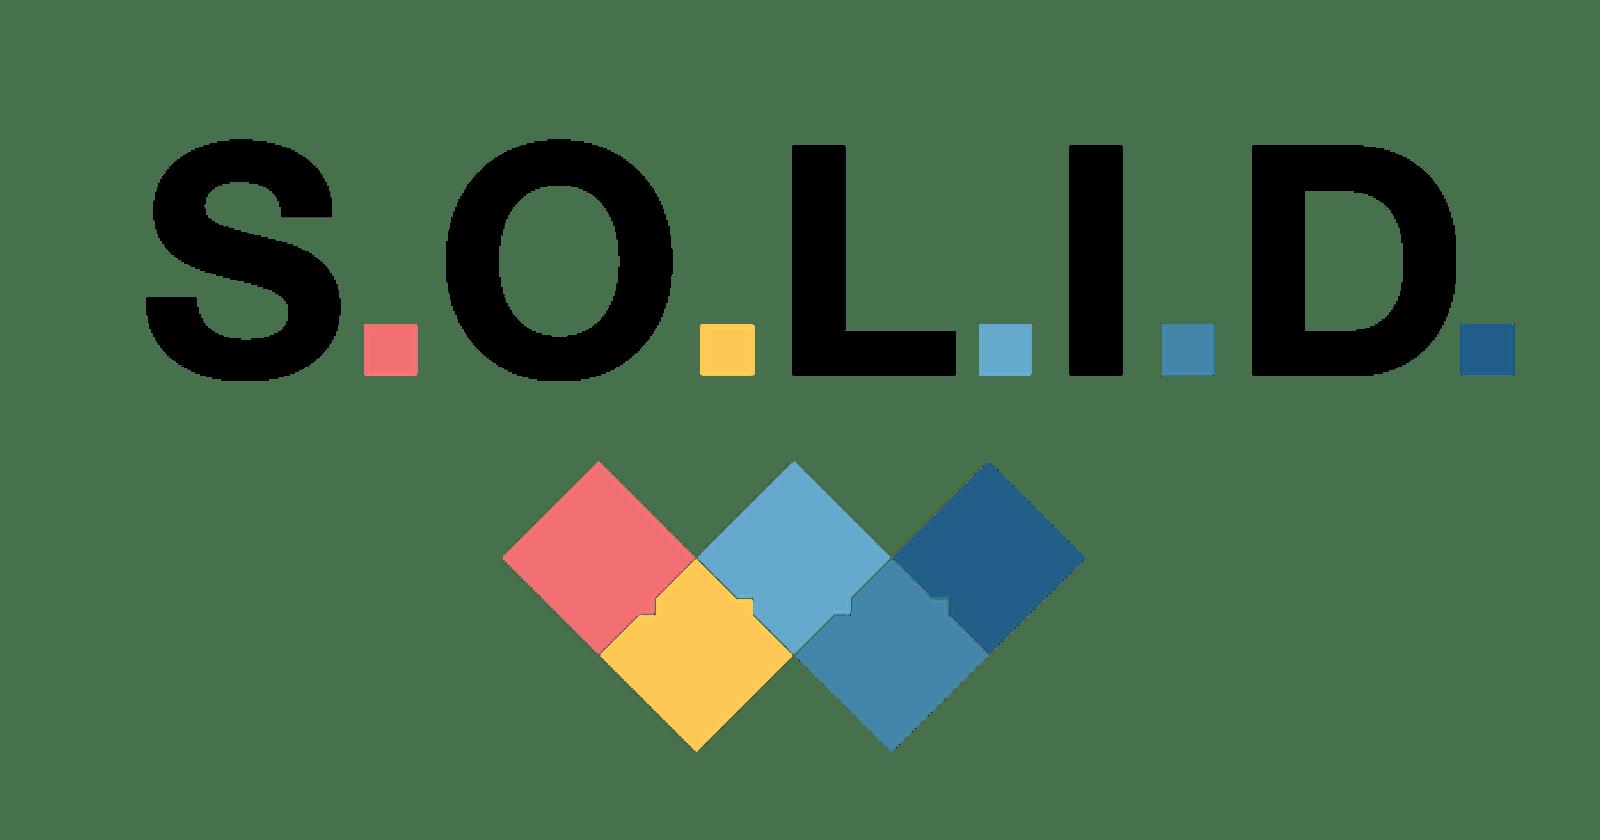 Princípios SOLID: o que são e como aplicá-los no PHP/Laravel (Parte 02 - Aberto-fechado)